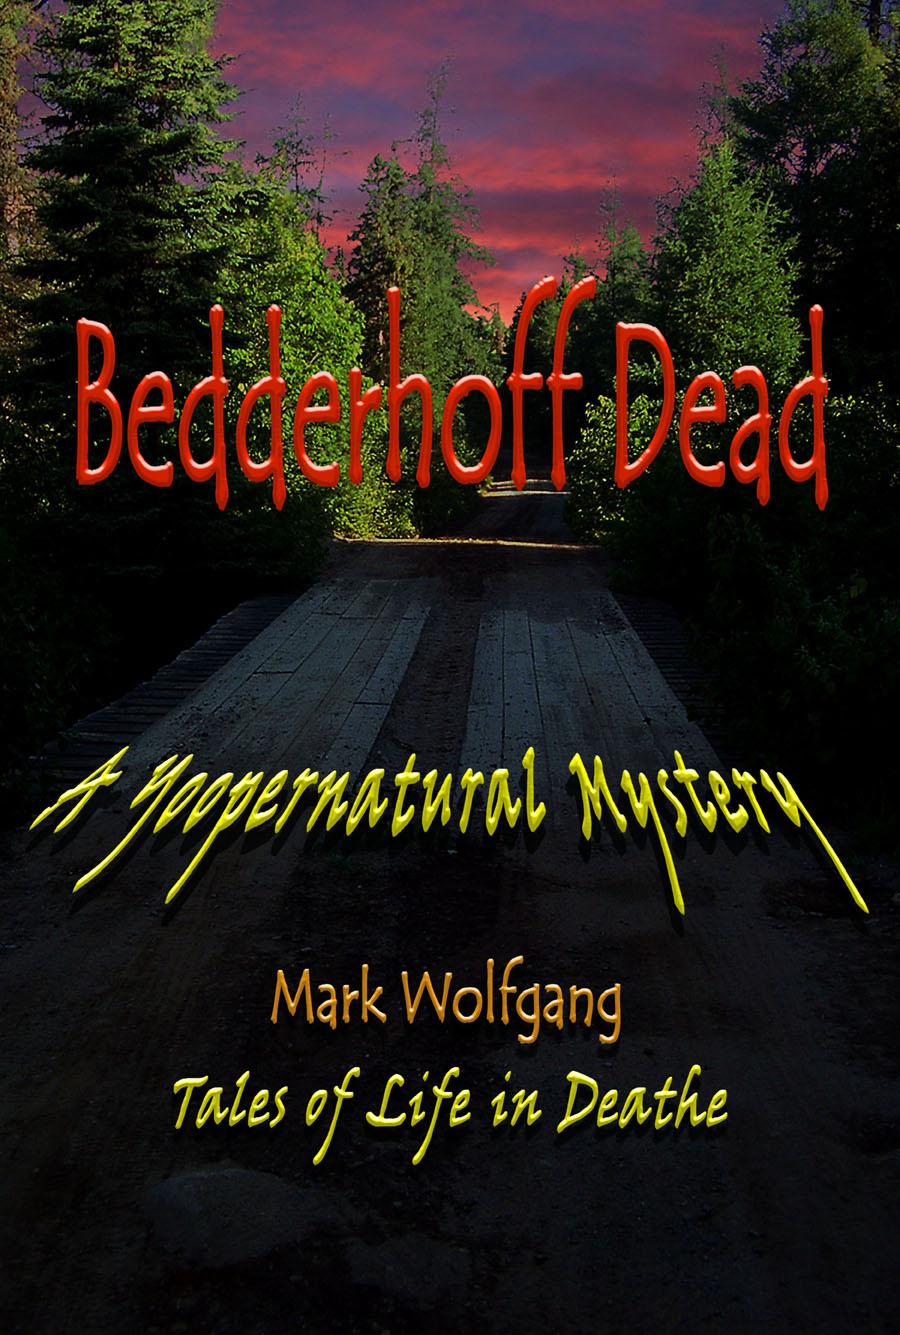 Bedderhoff Dead Image